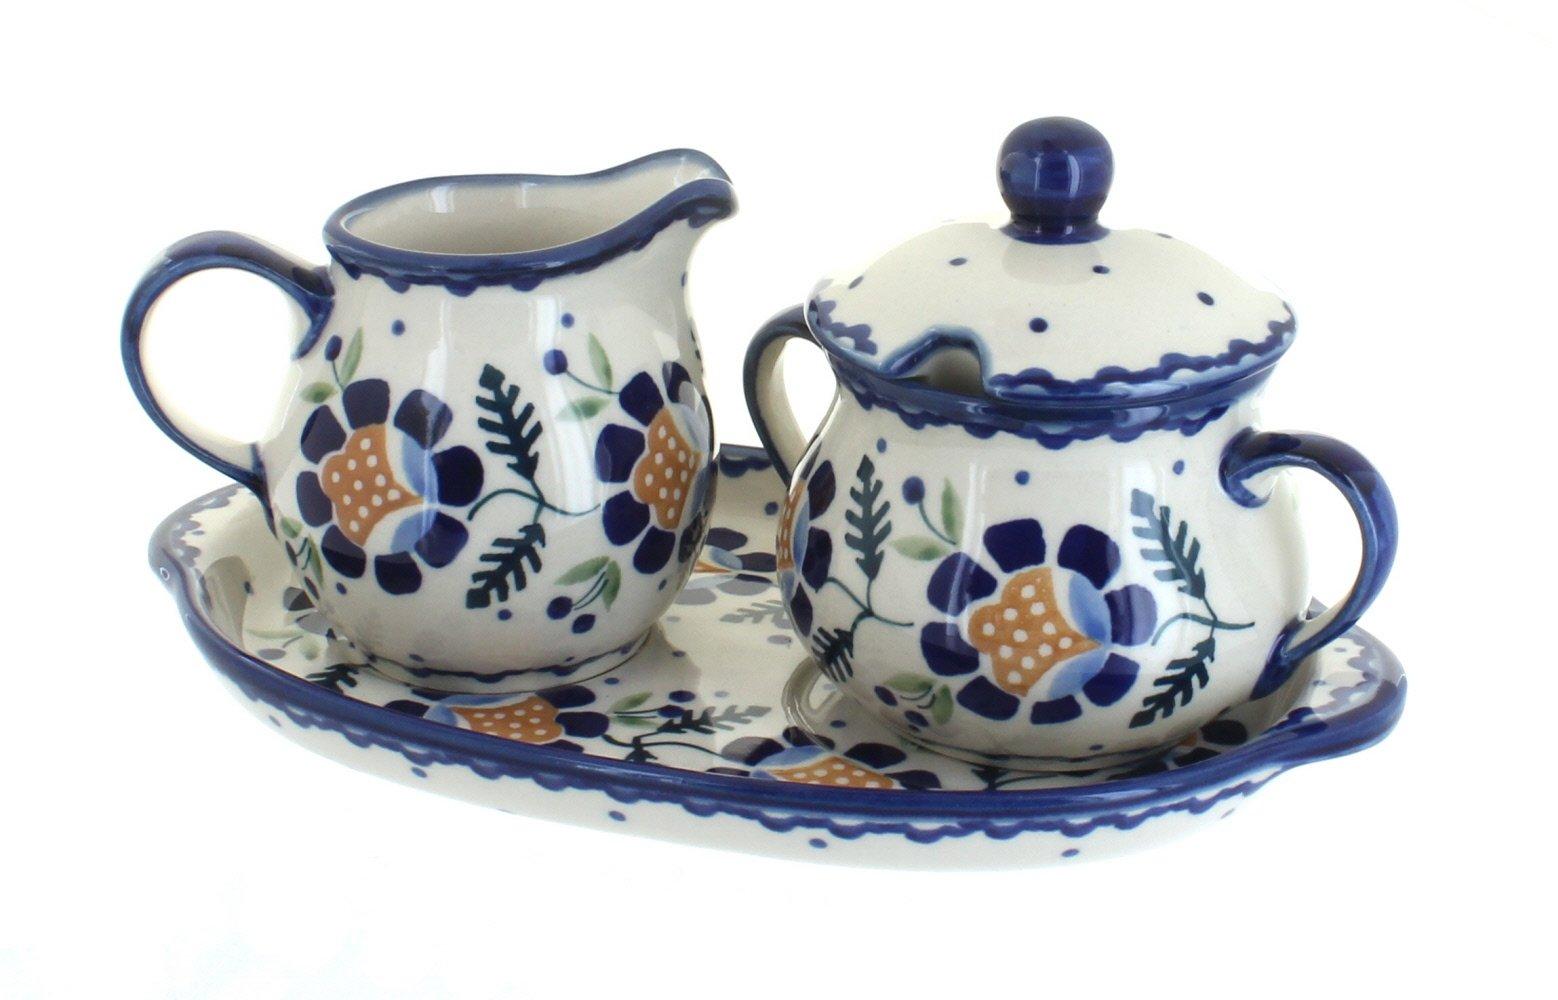 Blue Rose Polish Pottery Sunflower Sugar & Creamer Set with Tray